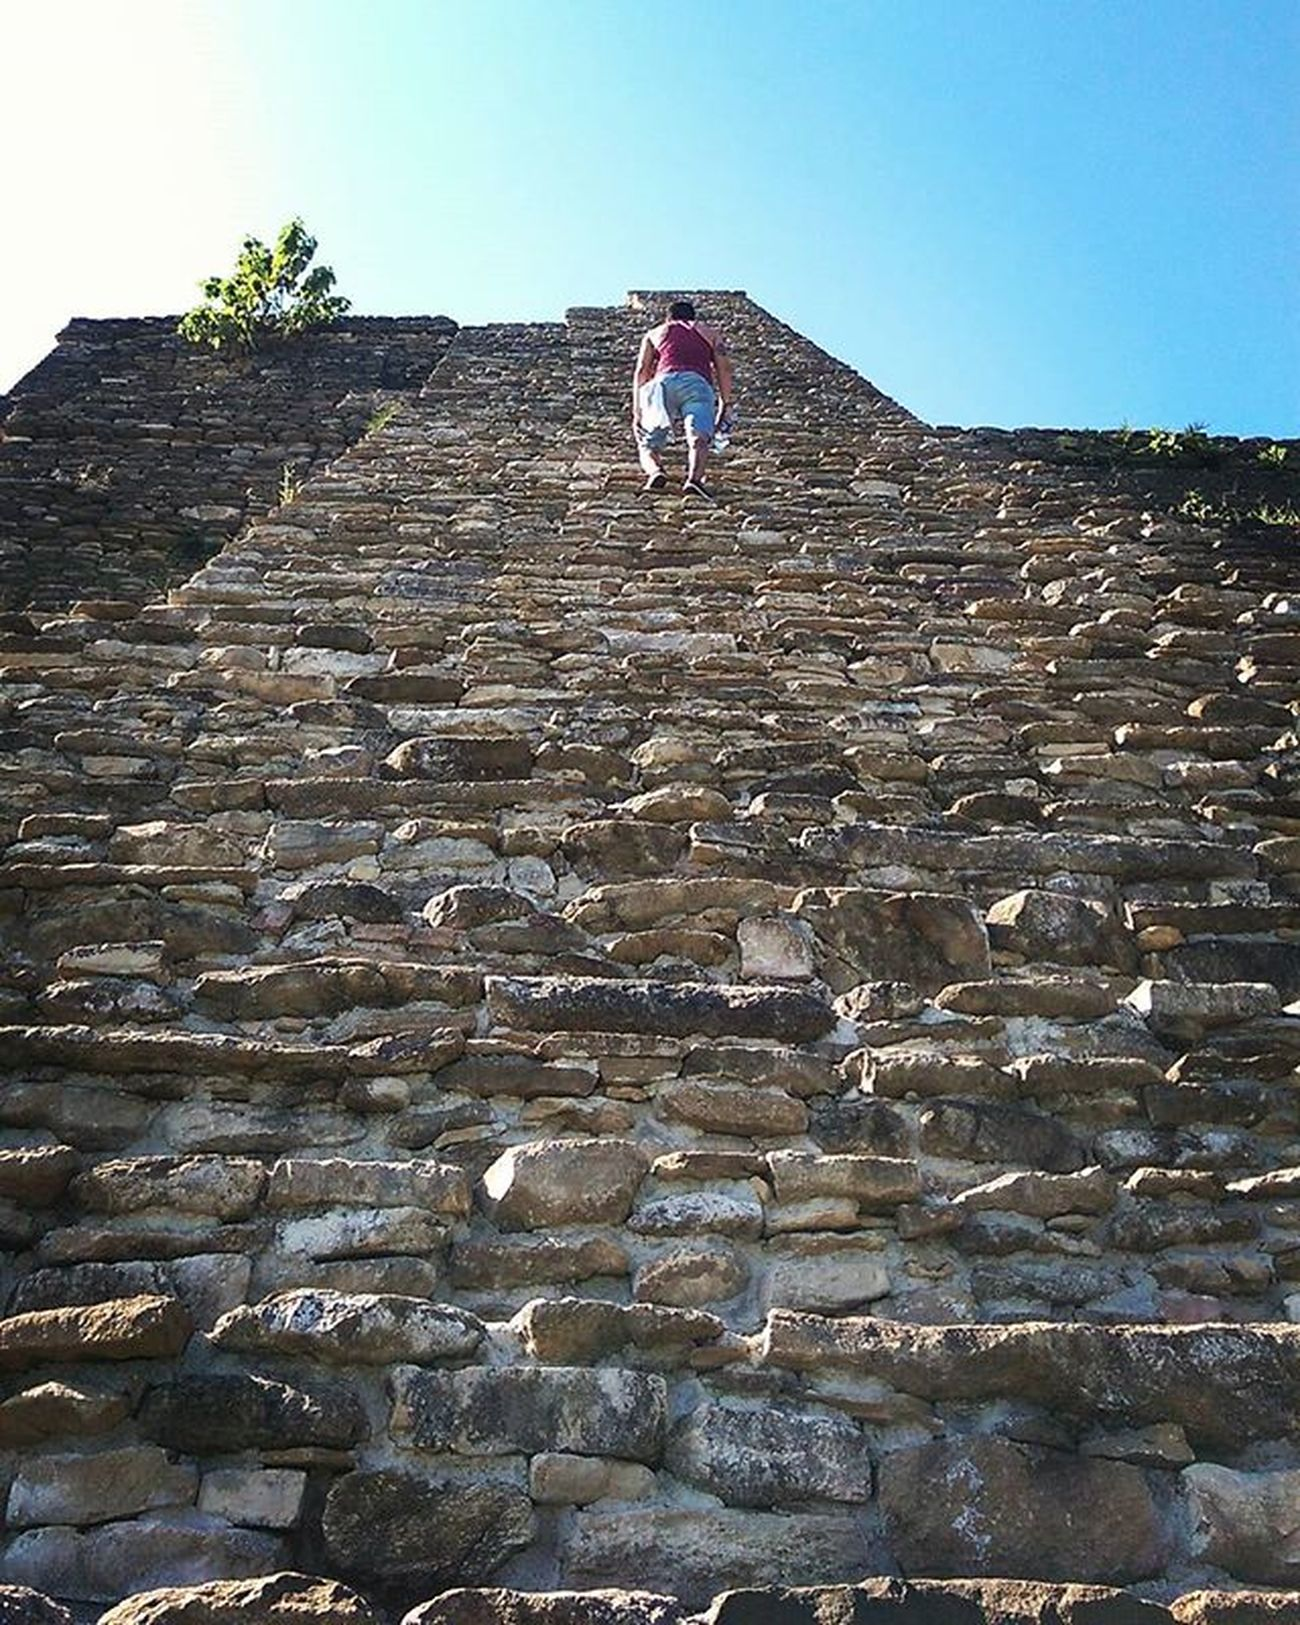 Tonina Chiapasmexico Chiapas Chiapasiónate TravelingMexico Traveling Instatravel Travelgram